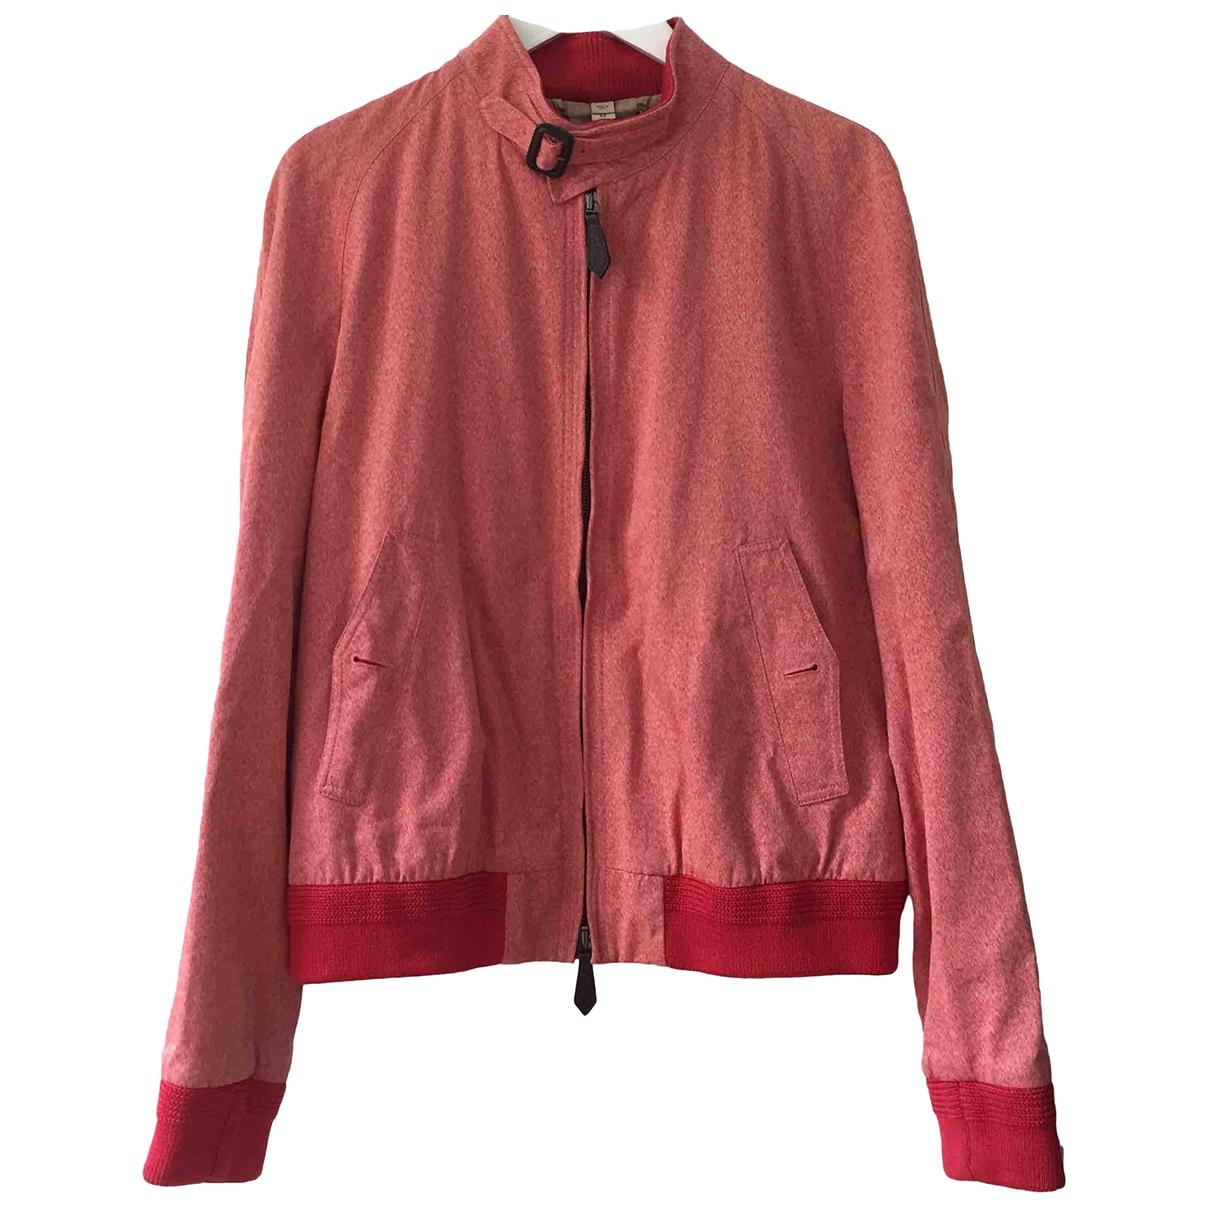 Burberry \N Jacke in  Rot Baumwolle